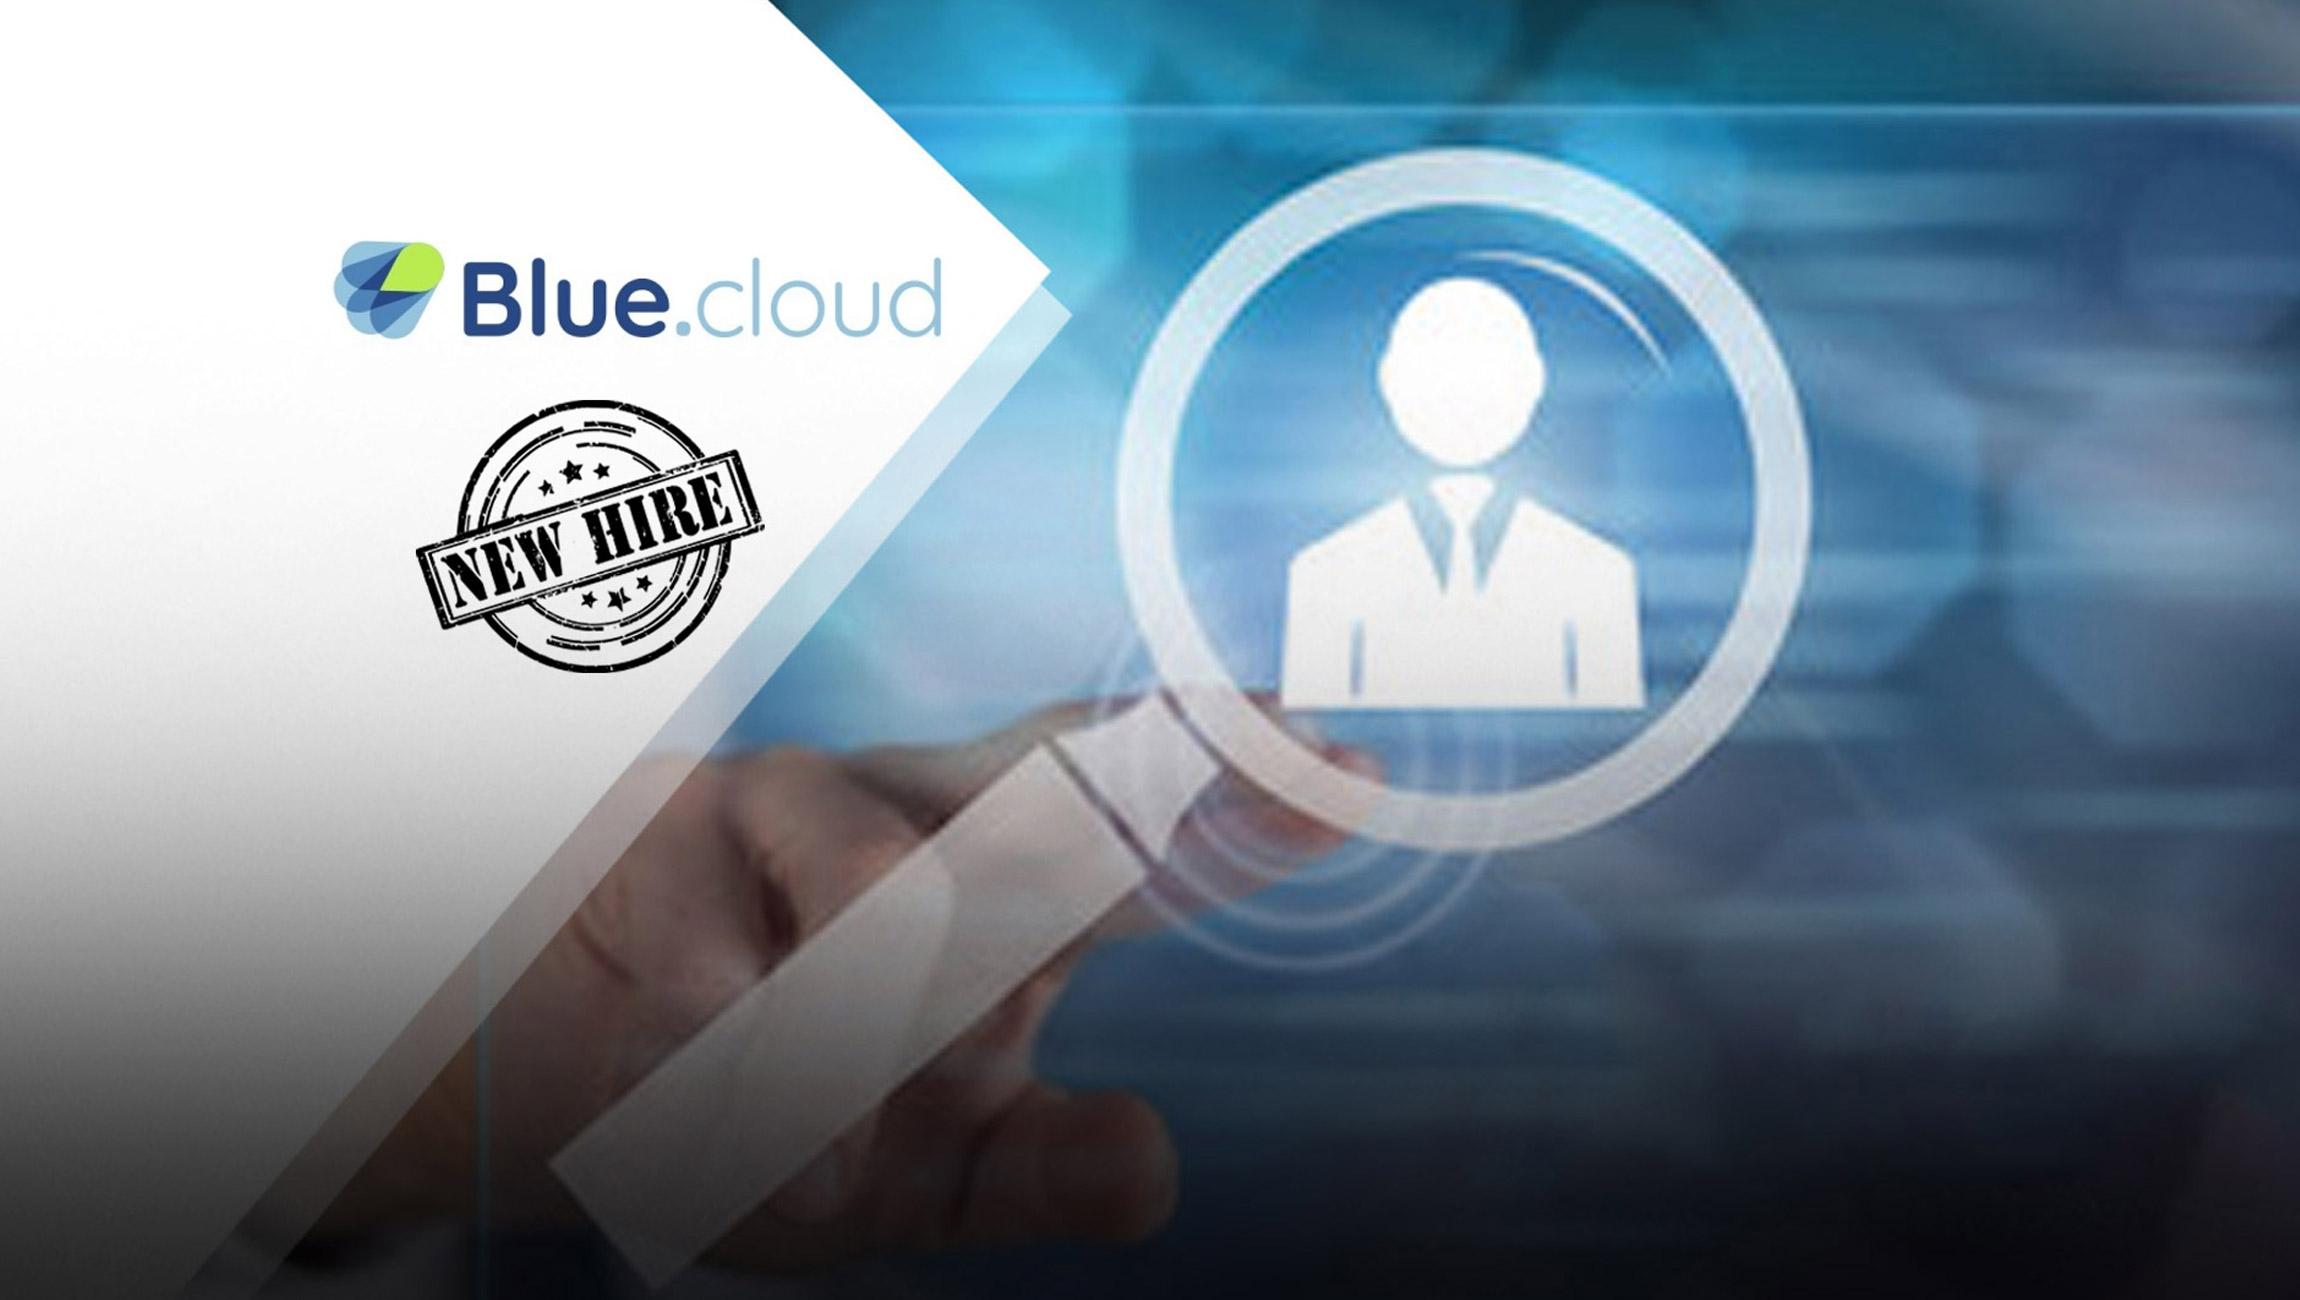 Blue.cloud-Taps-Brian-Alvarez-as-'EVP_-Corporate-Development_'-a-New_-Growth-Focused-Leadership-Position-at-the-Company